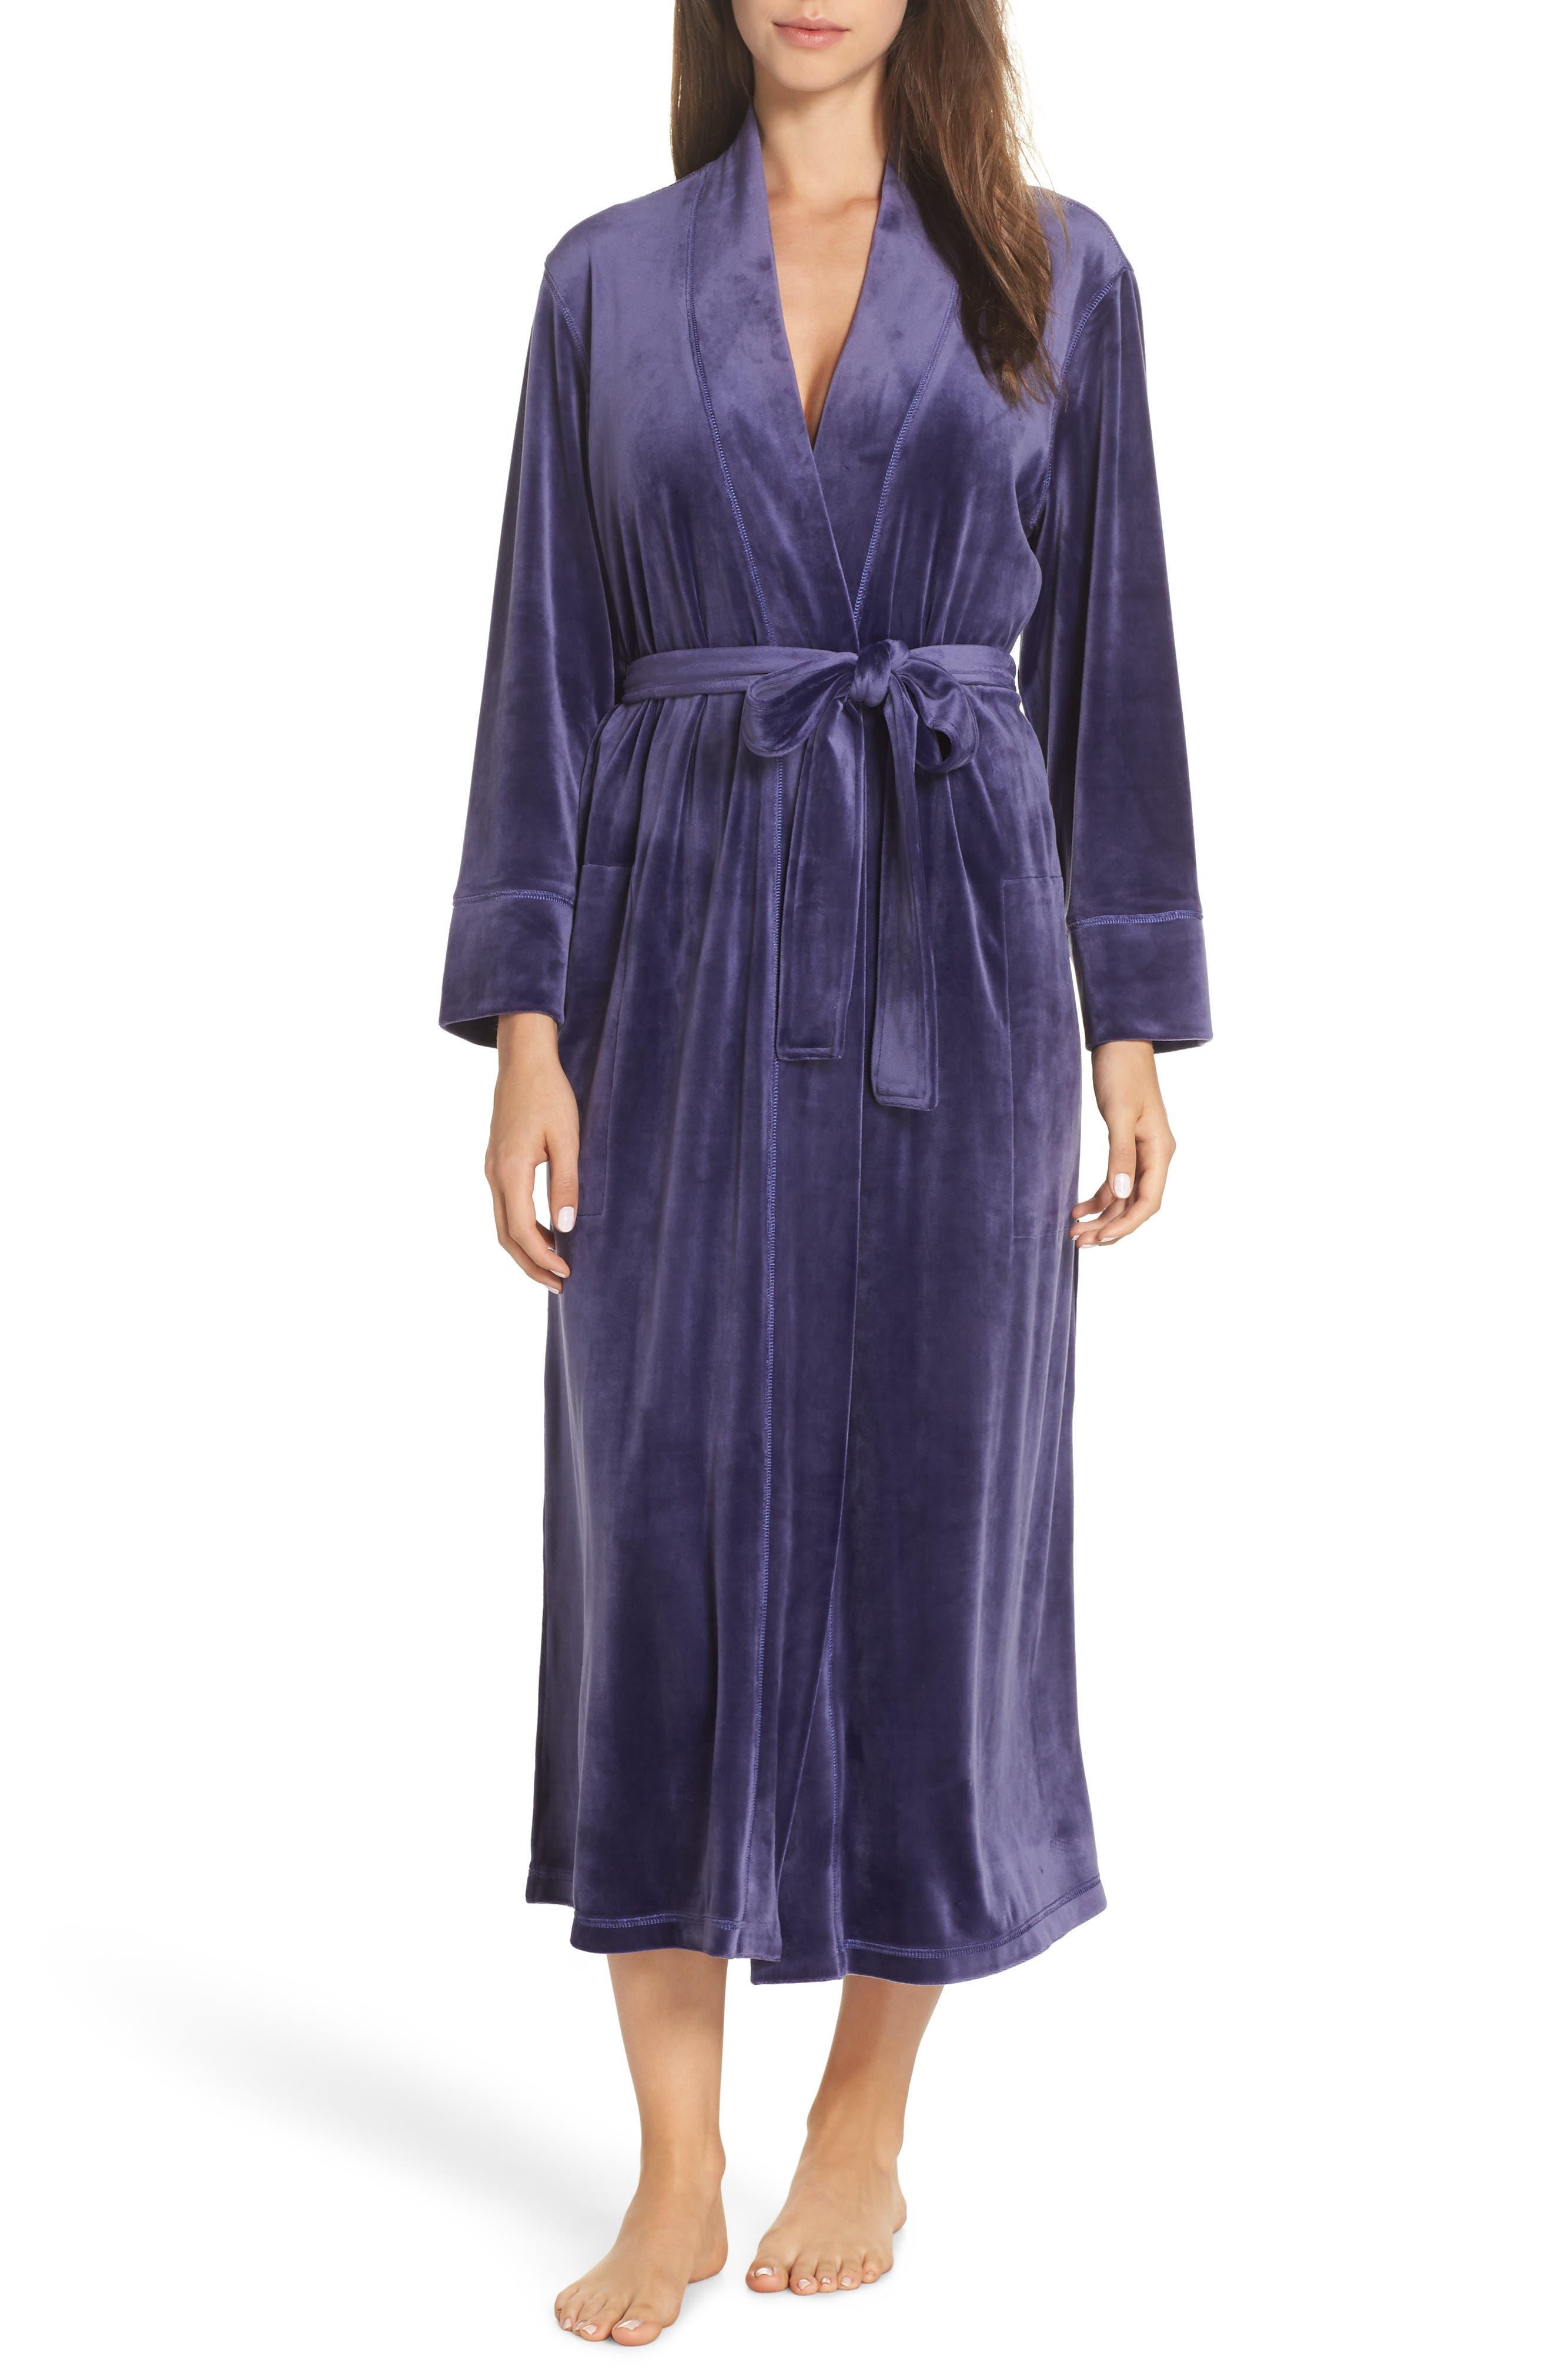 Vintage Nightgowns, Pajamas, Baby Dolls, Robes Womens Natori Plush Velour Robe Size X-Large - Purple $150.00 AT vintagedancer.com